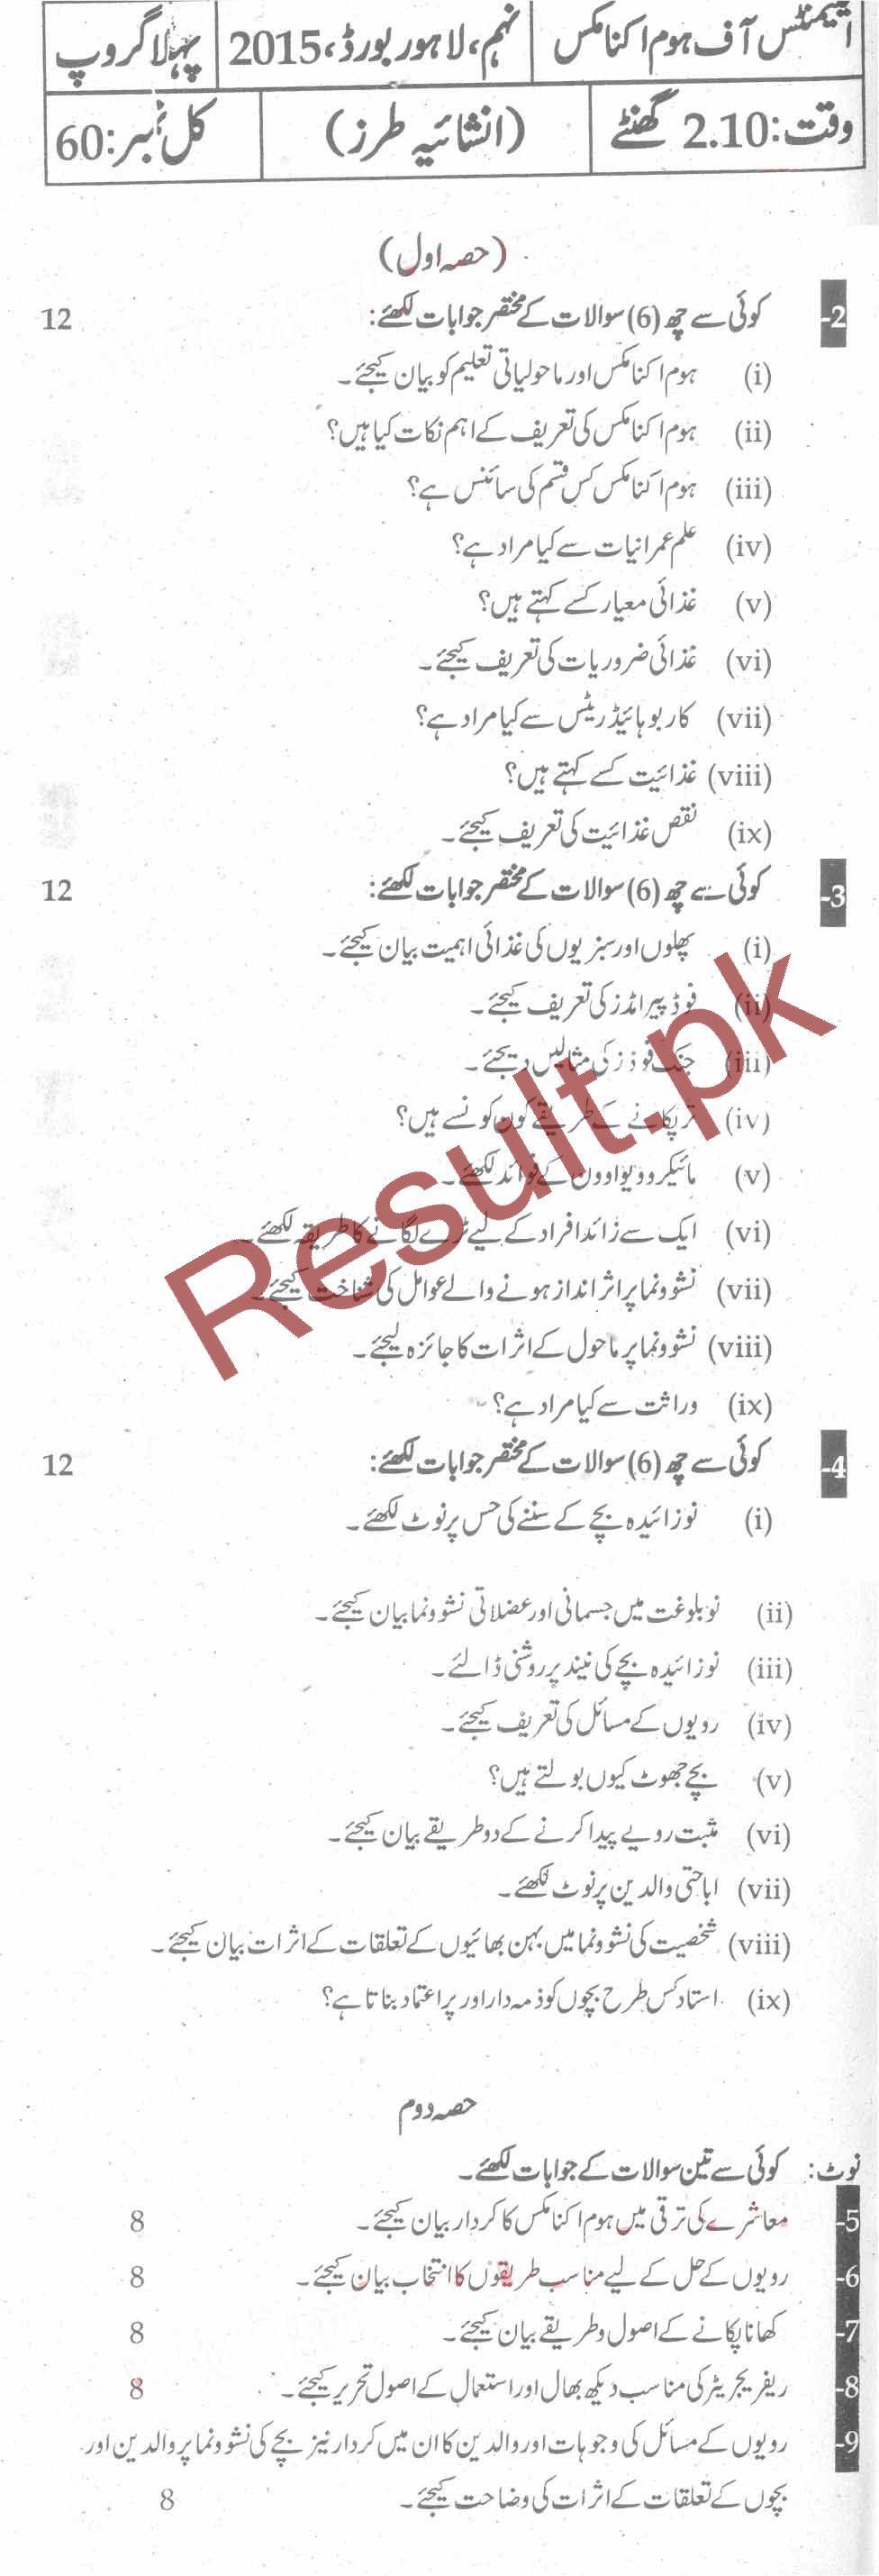 BISE DG Khan Board Past Papers 2019 Matric, SSC Part 1 & 2